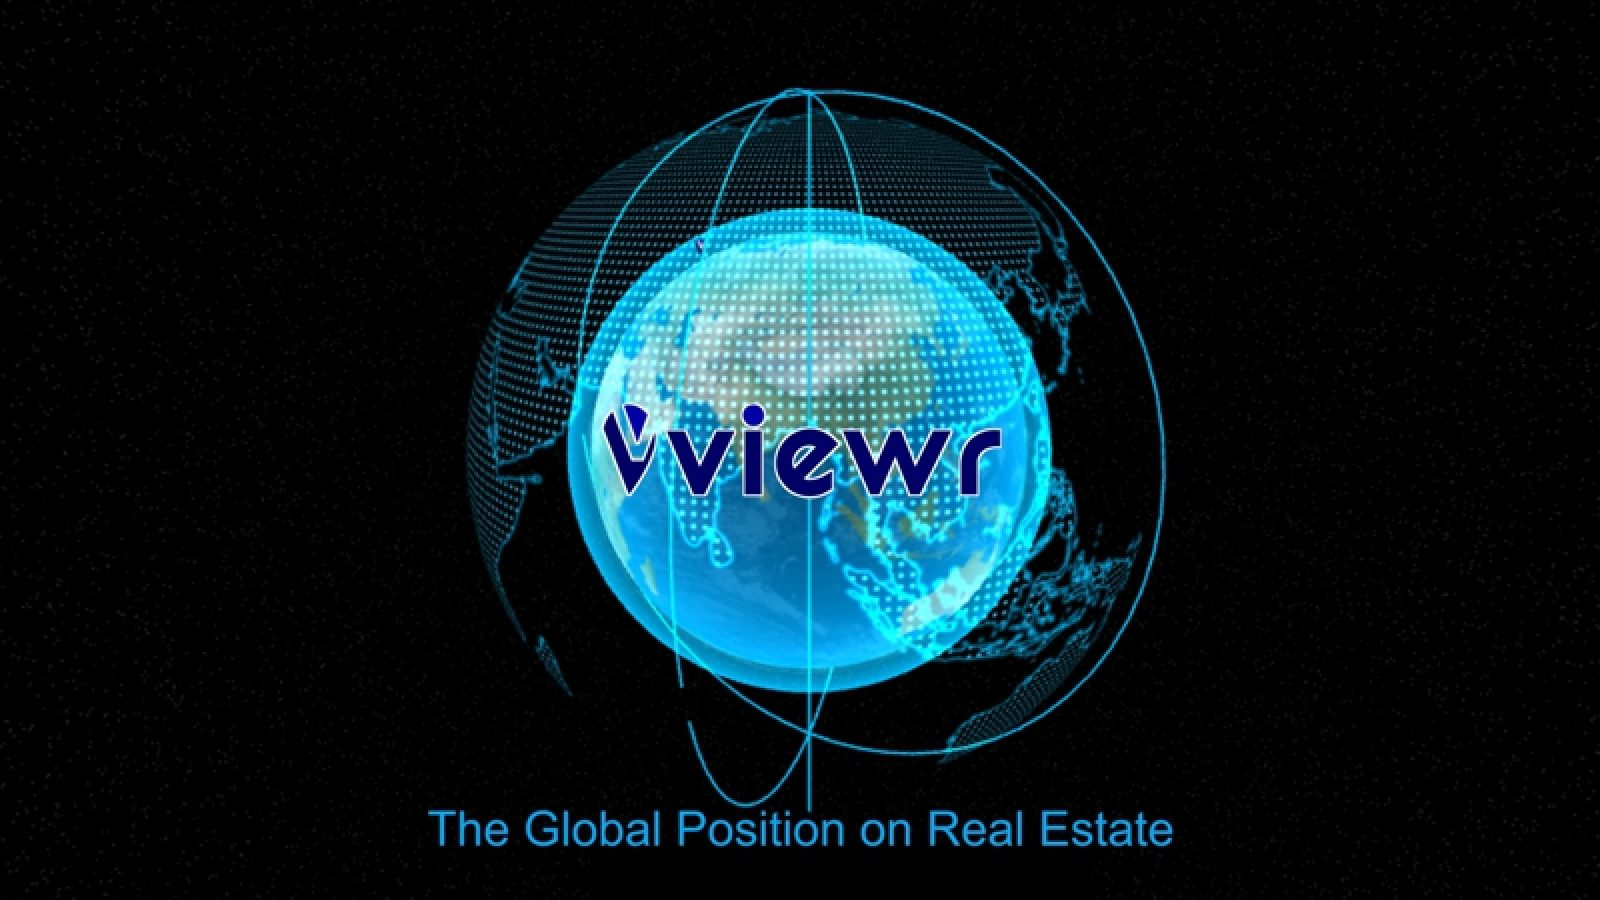 viewr VR Screenshot The Global Position on Real Estate. 800x450jpg